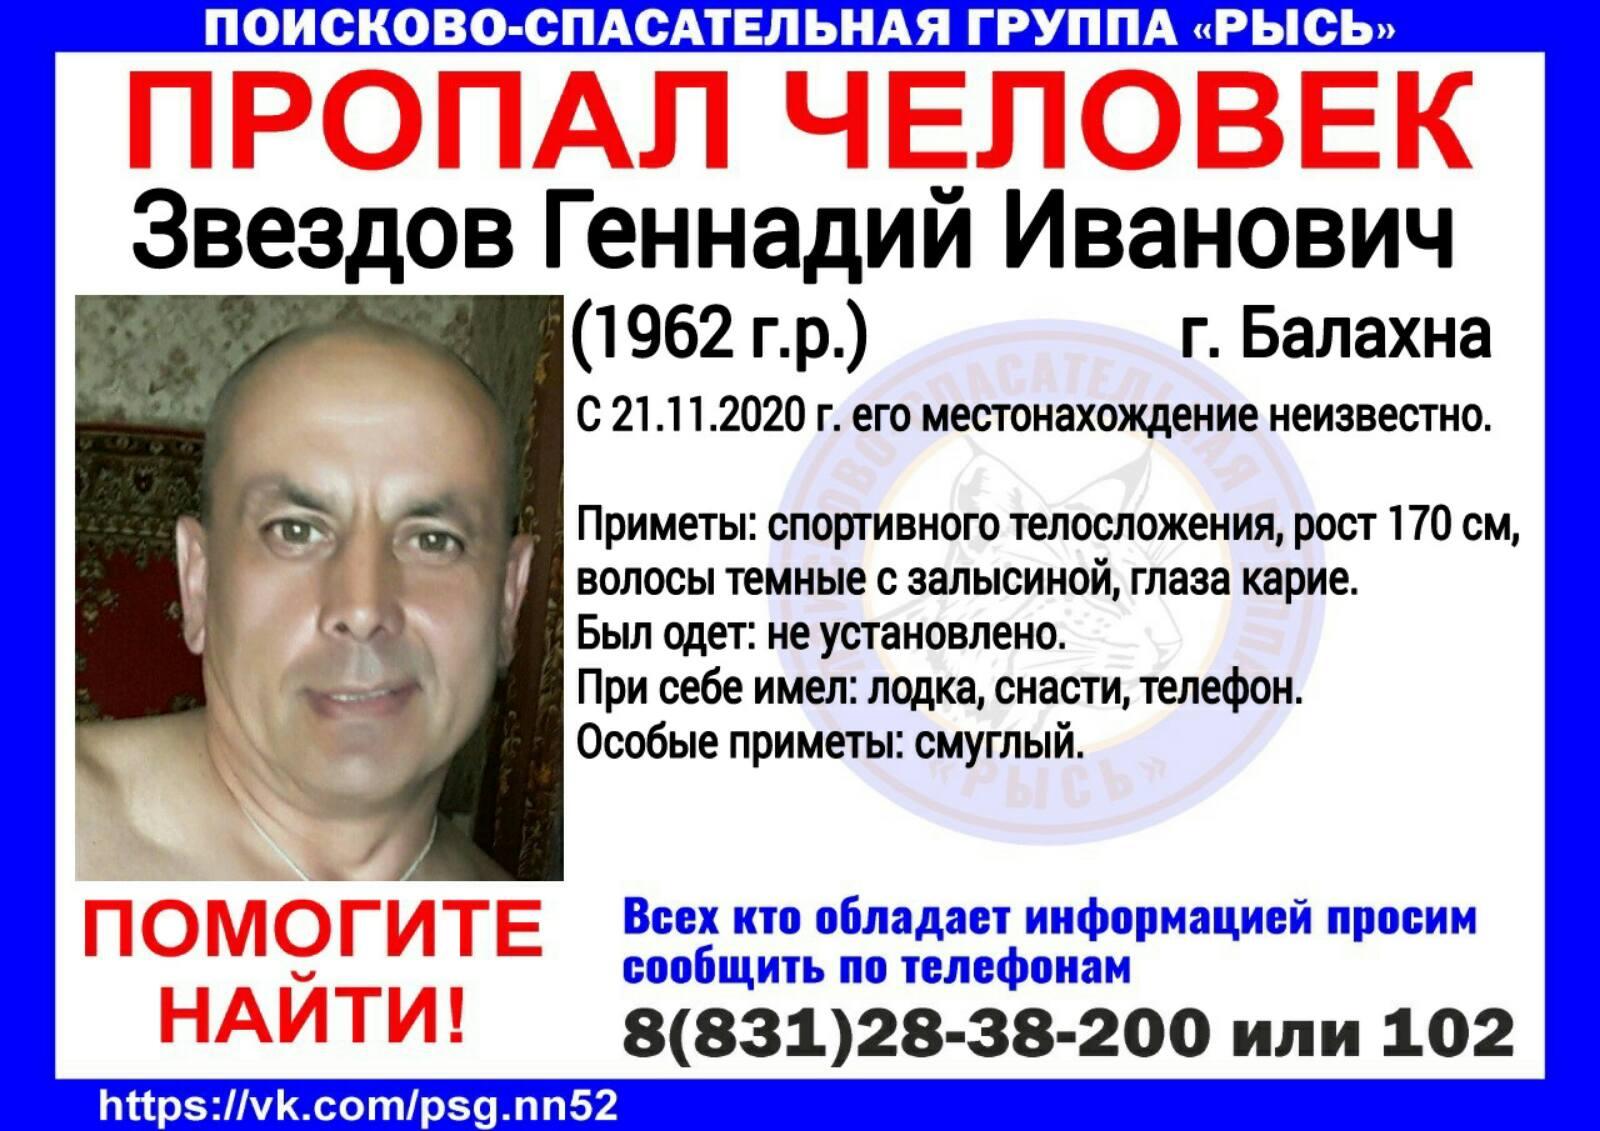 Звездов Геннадий Иванович